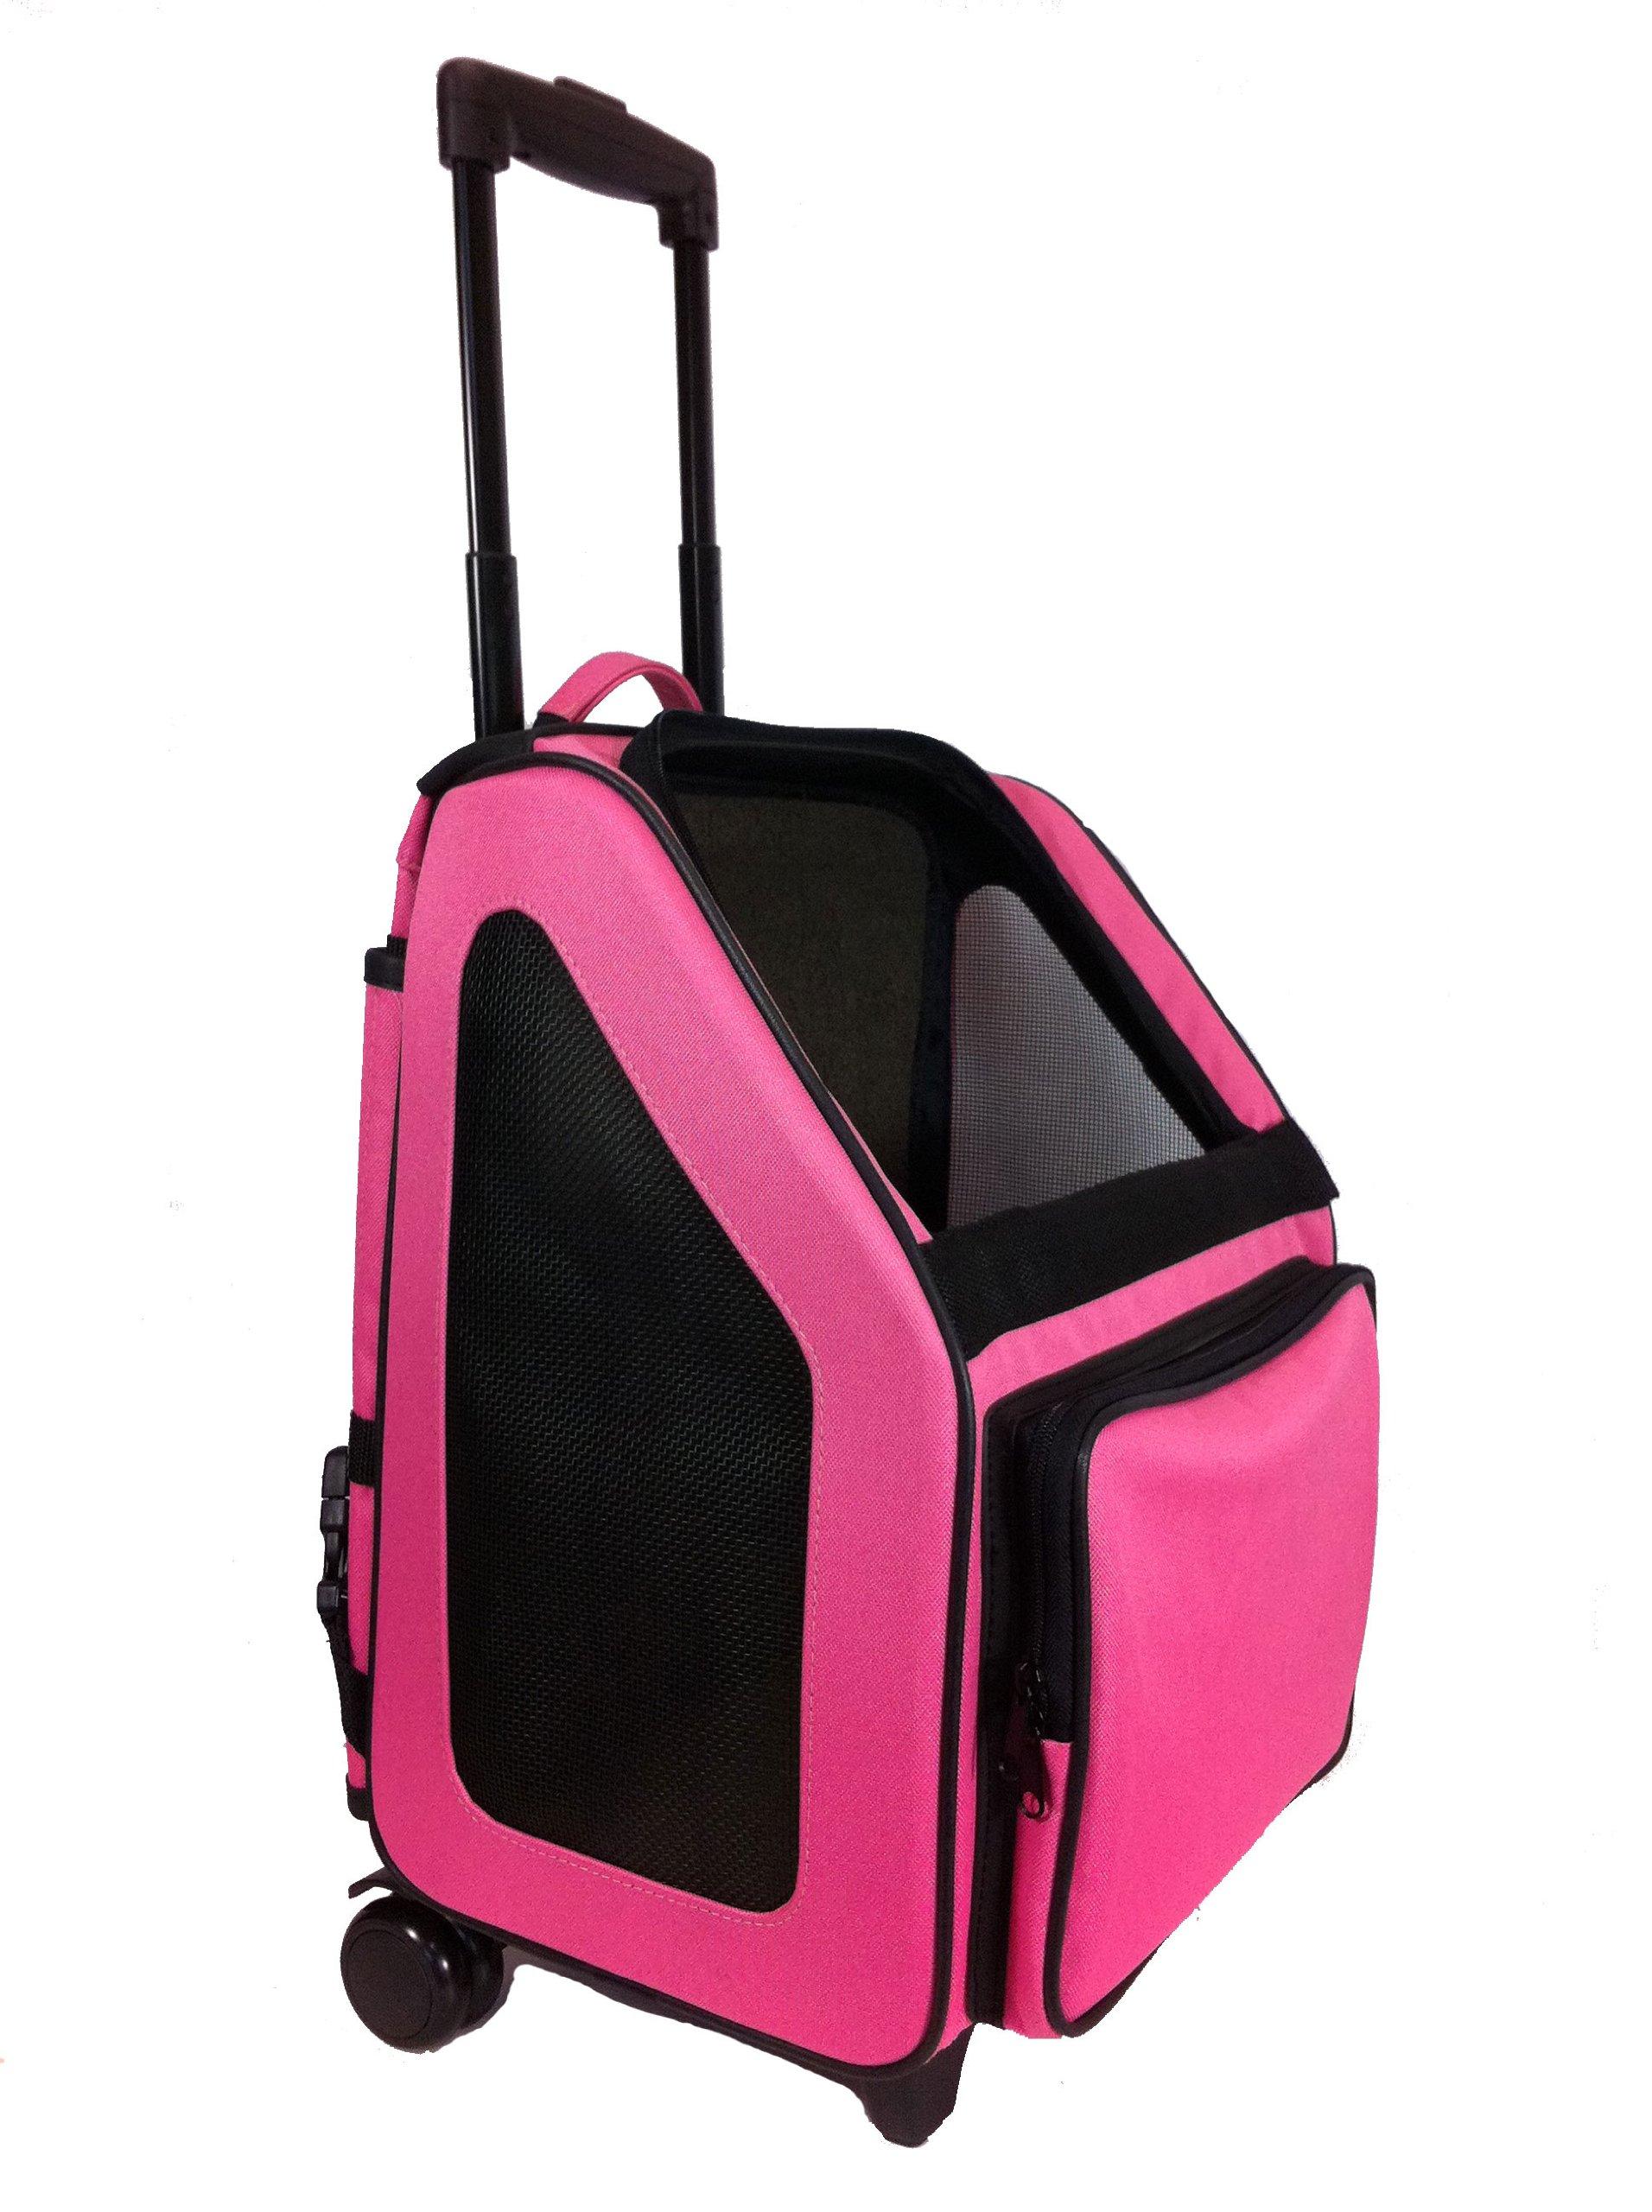 Petote Rio Pet Carrier Bag on Wheels, Black Trim/Fuchsia Pink by Petote